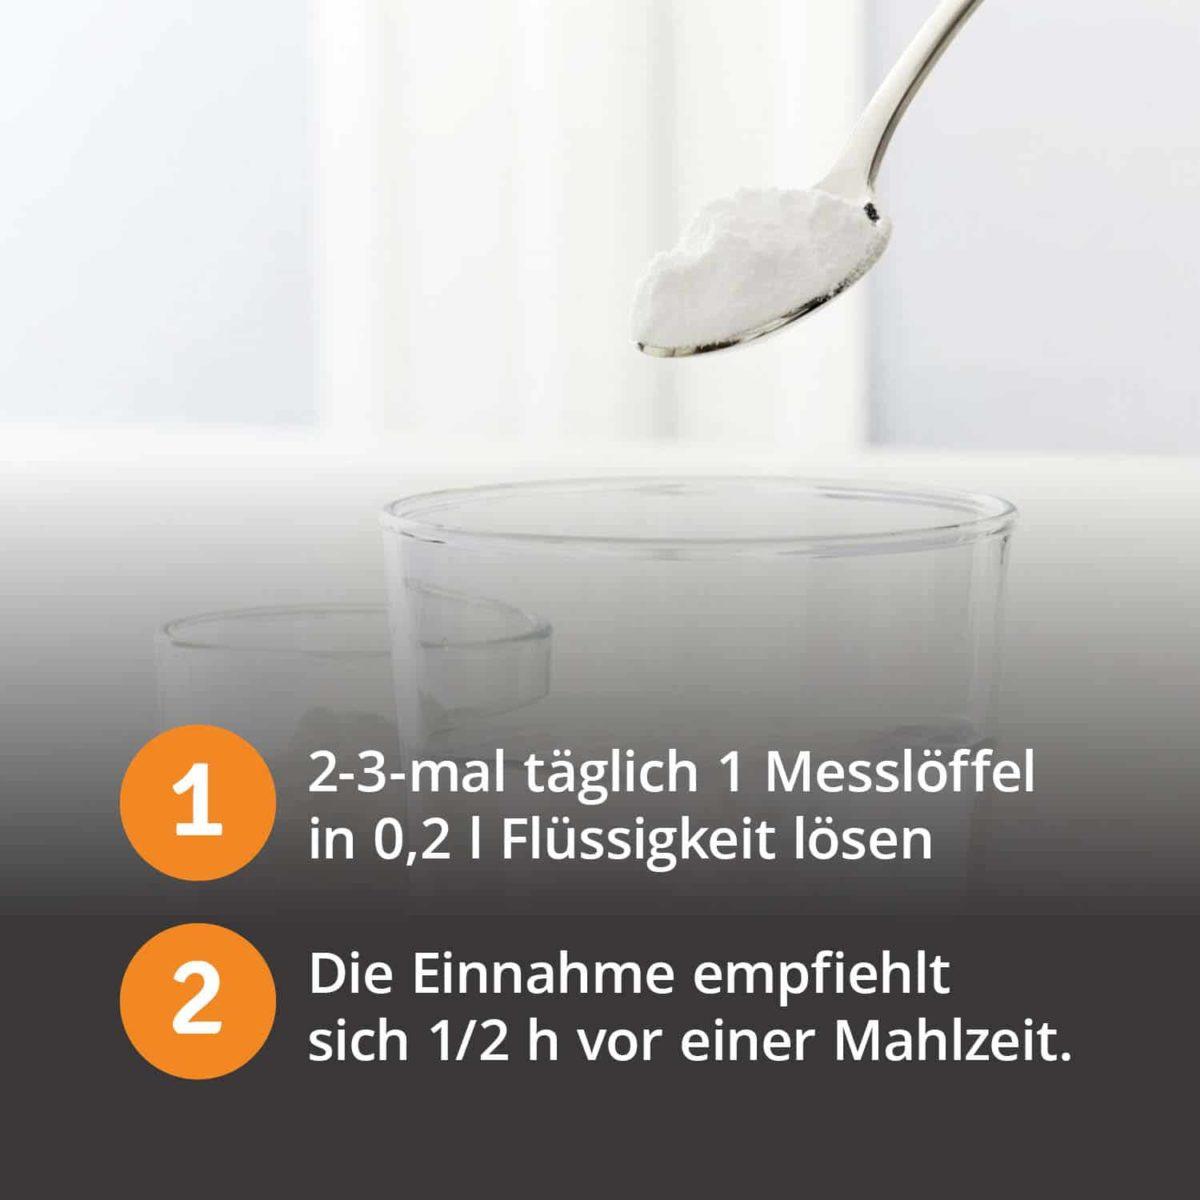 Casida Natron Vital Powder– 300 g 12464638 PZN Apotheke Basenkur trinken Lebensmittel7